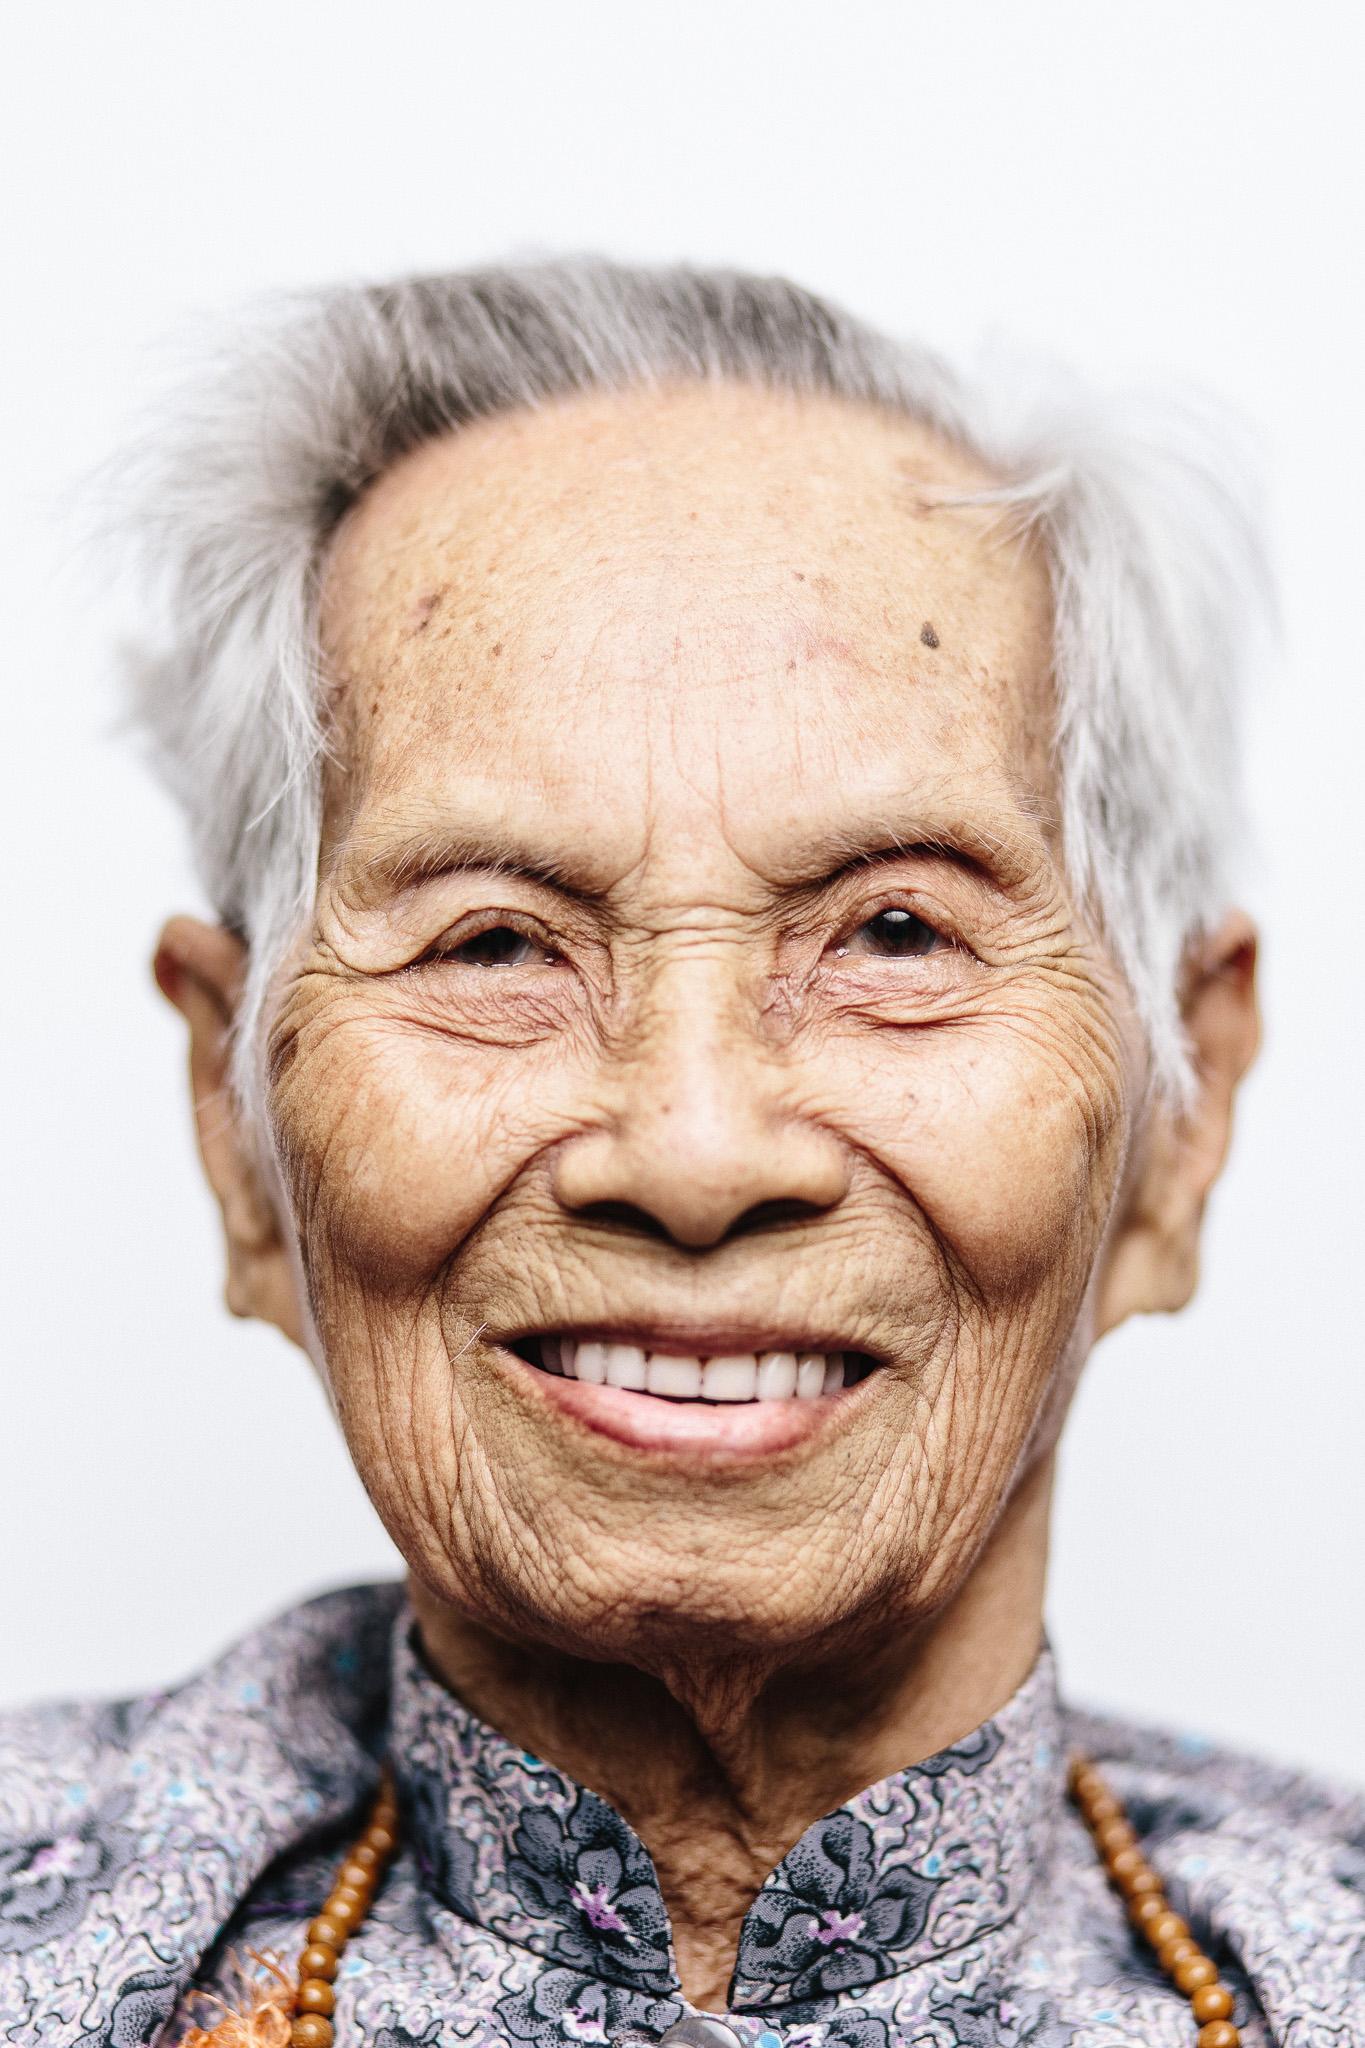 zainal-zainal-studio-centenarians-care-duke-nus-singapore-photographer-09.jpg